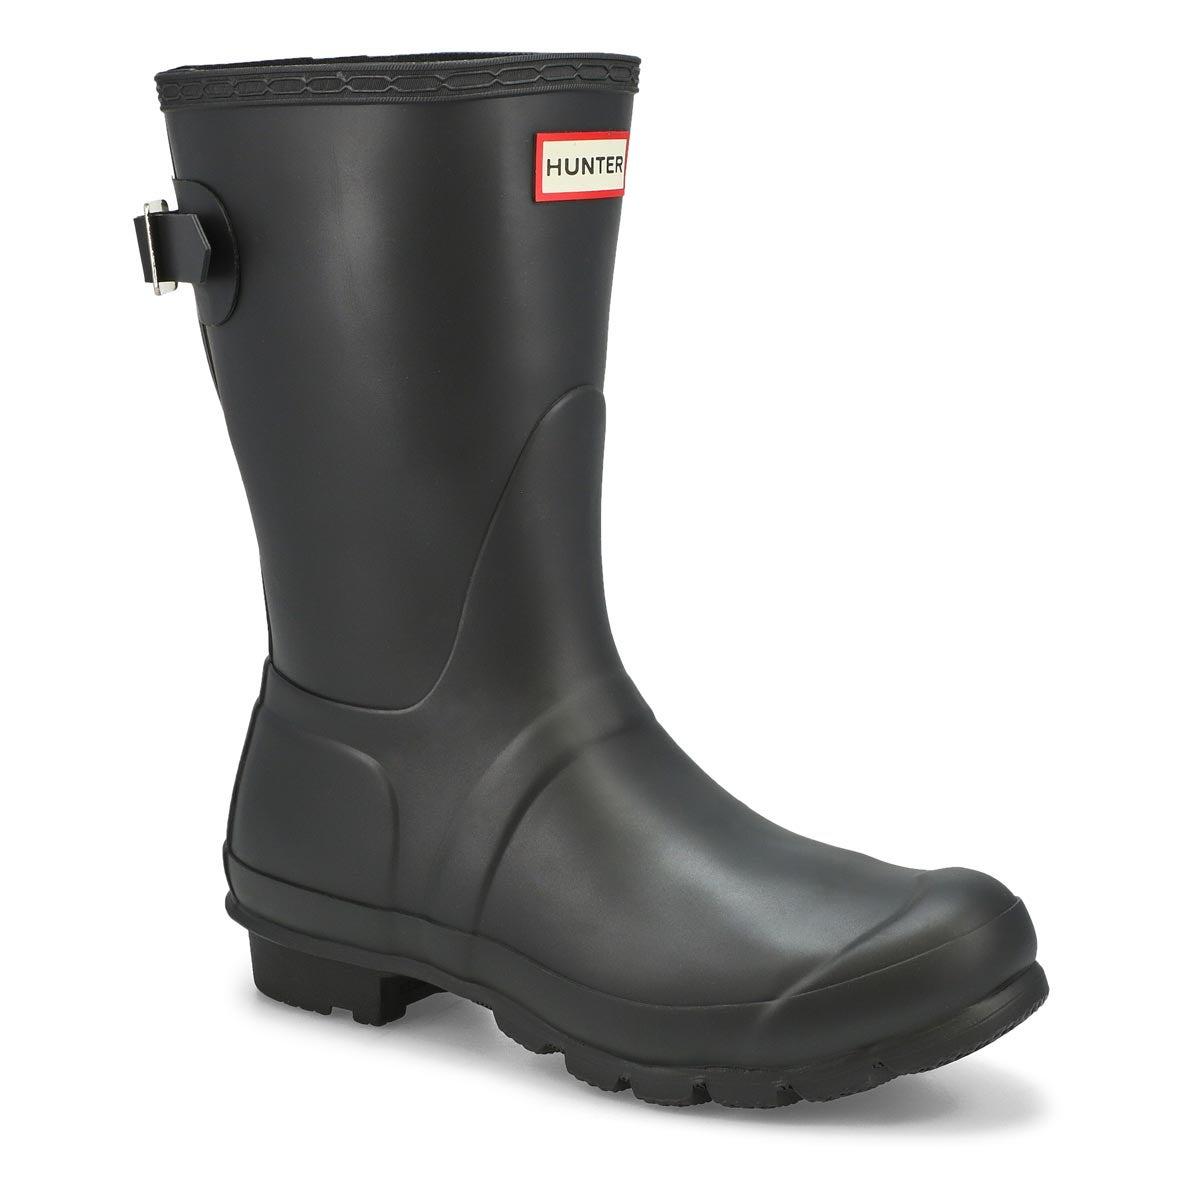 Women's ORIGINAL ADJUSTABLE SHORT black rain boots